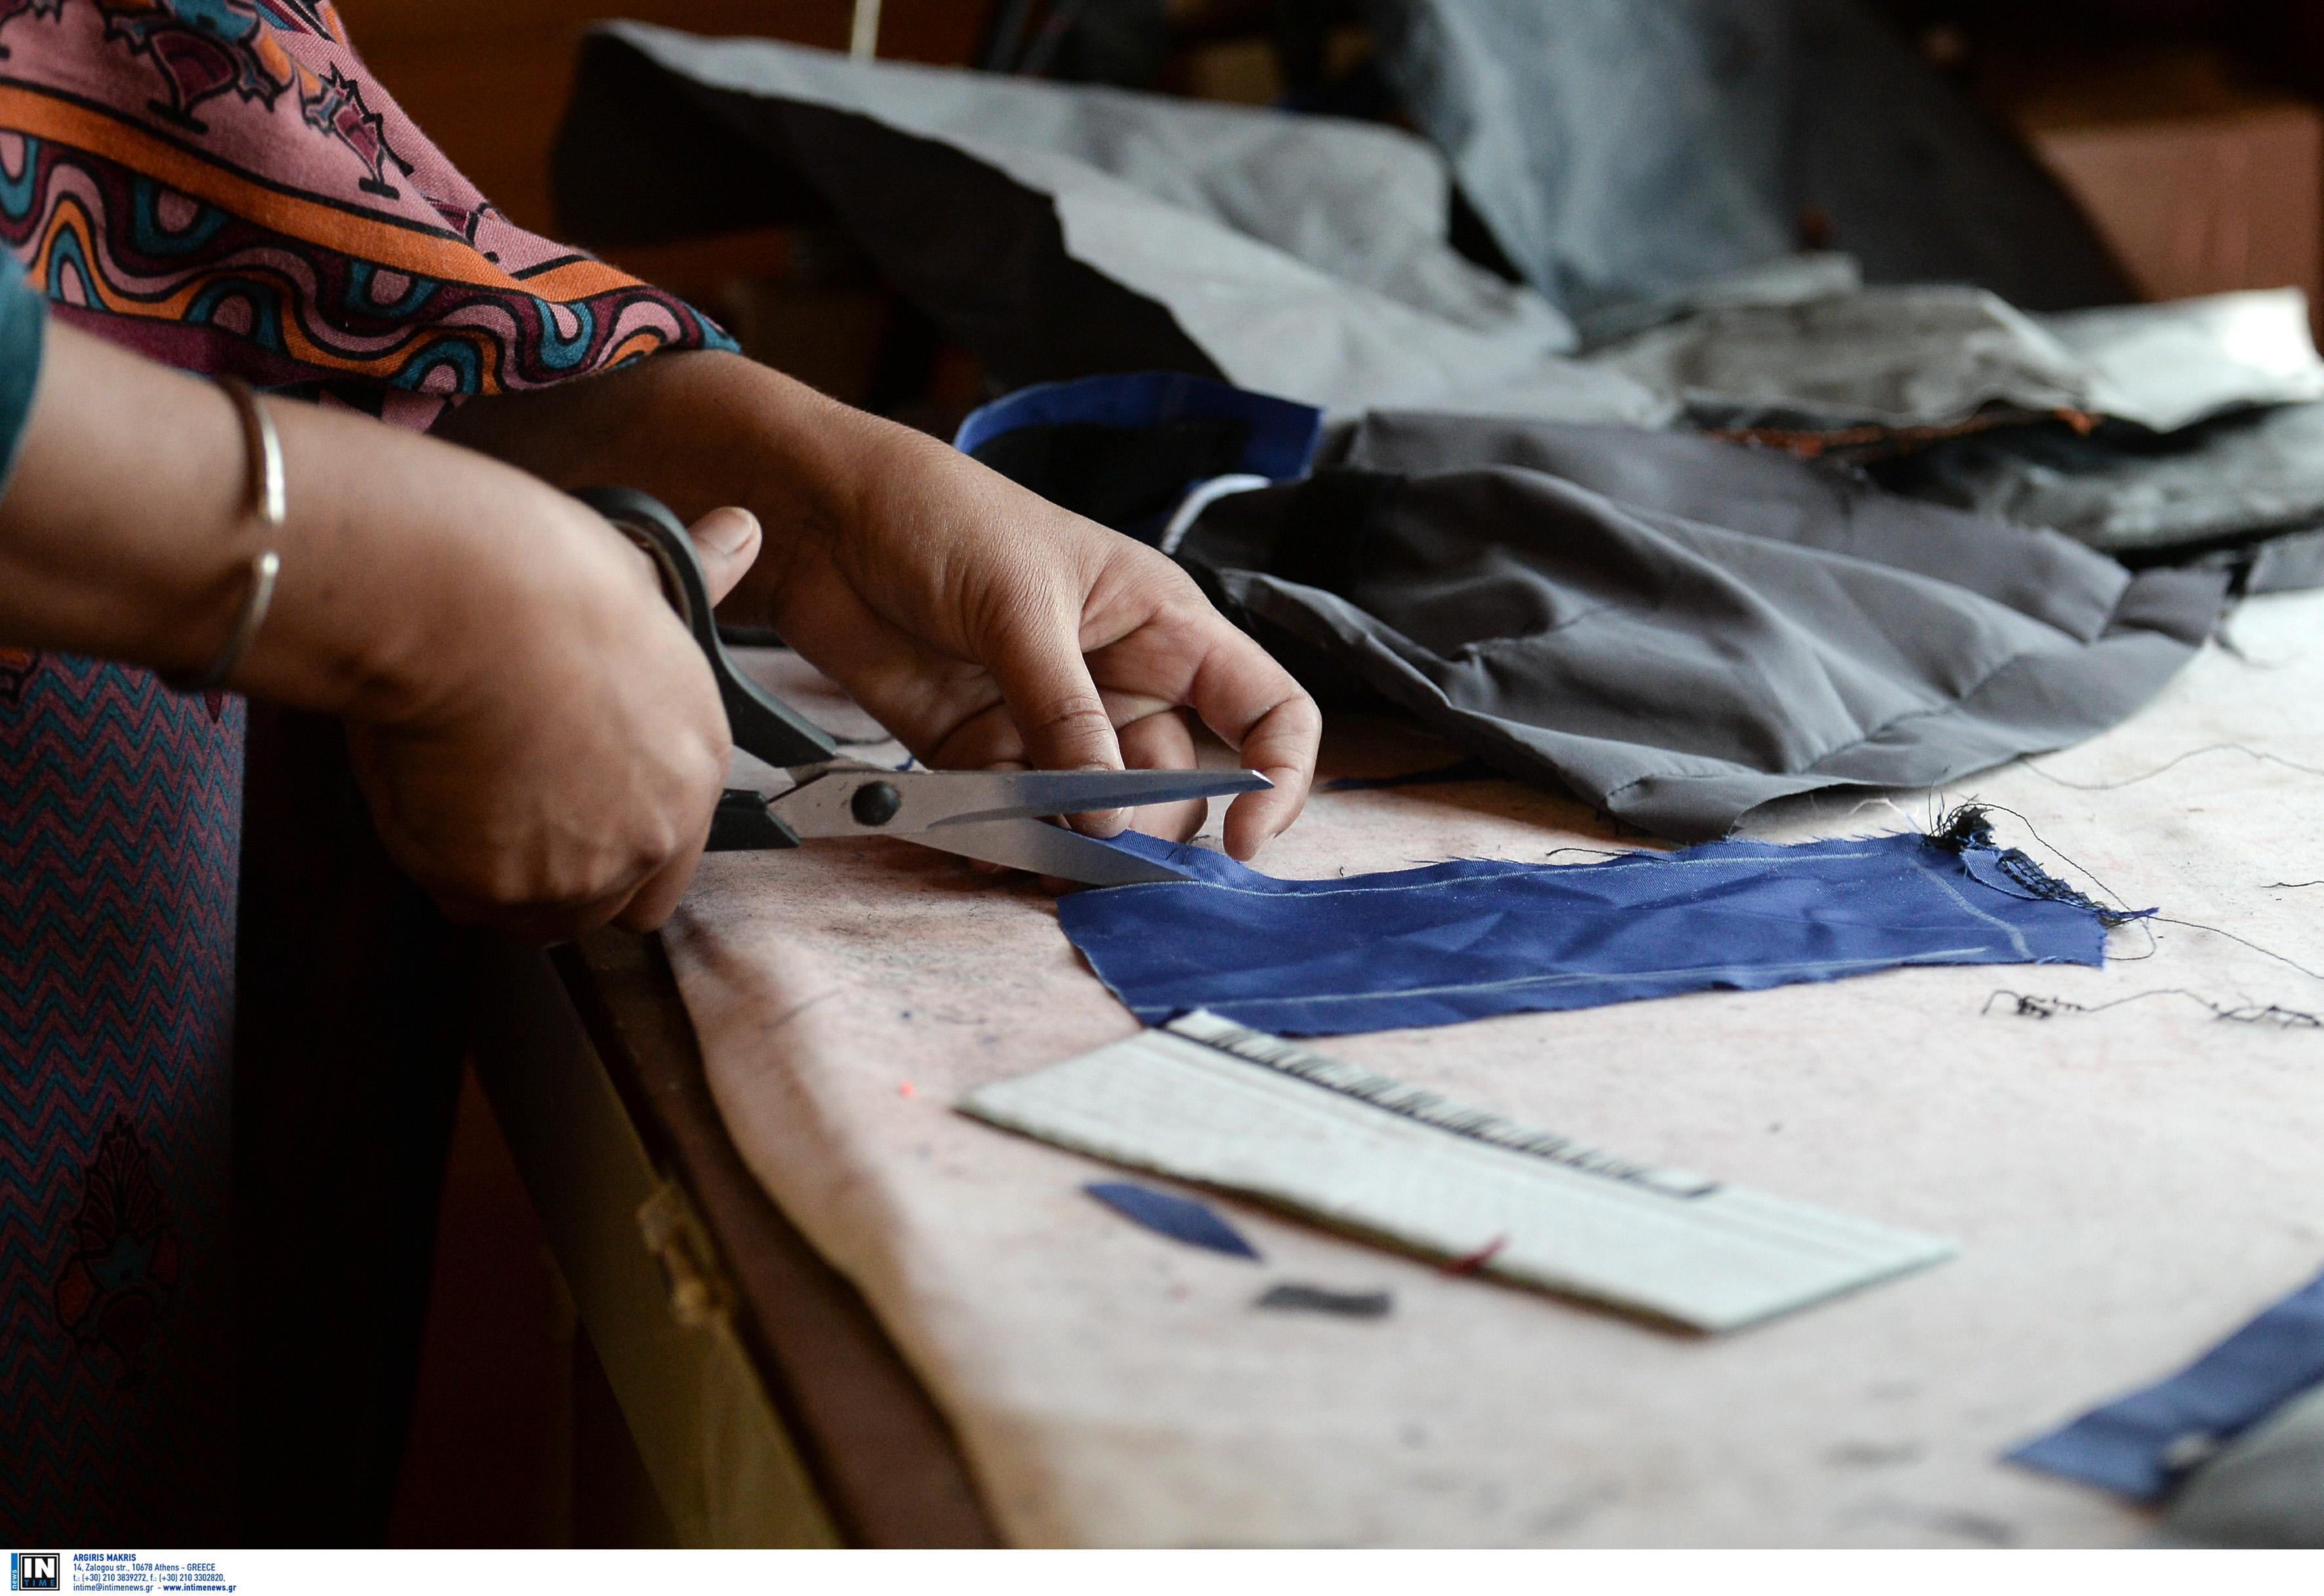 Bελτιώθηκαν τον Ιούλιο oι επιχειρηματικές συνθήκες στη μεταποίηση | tovima.gr